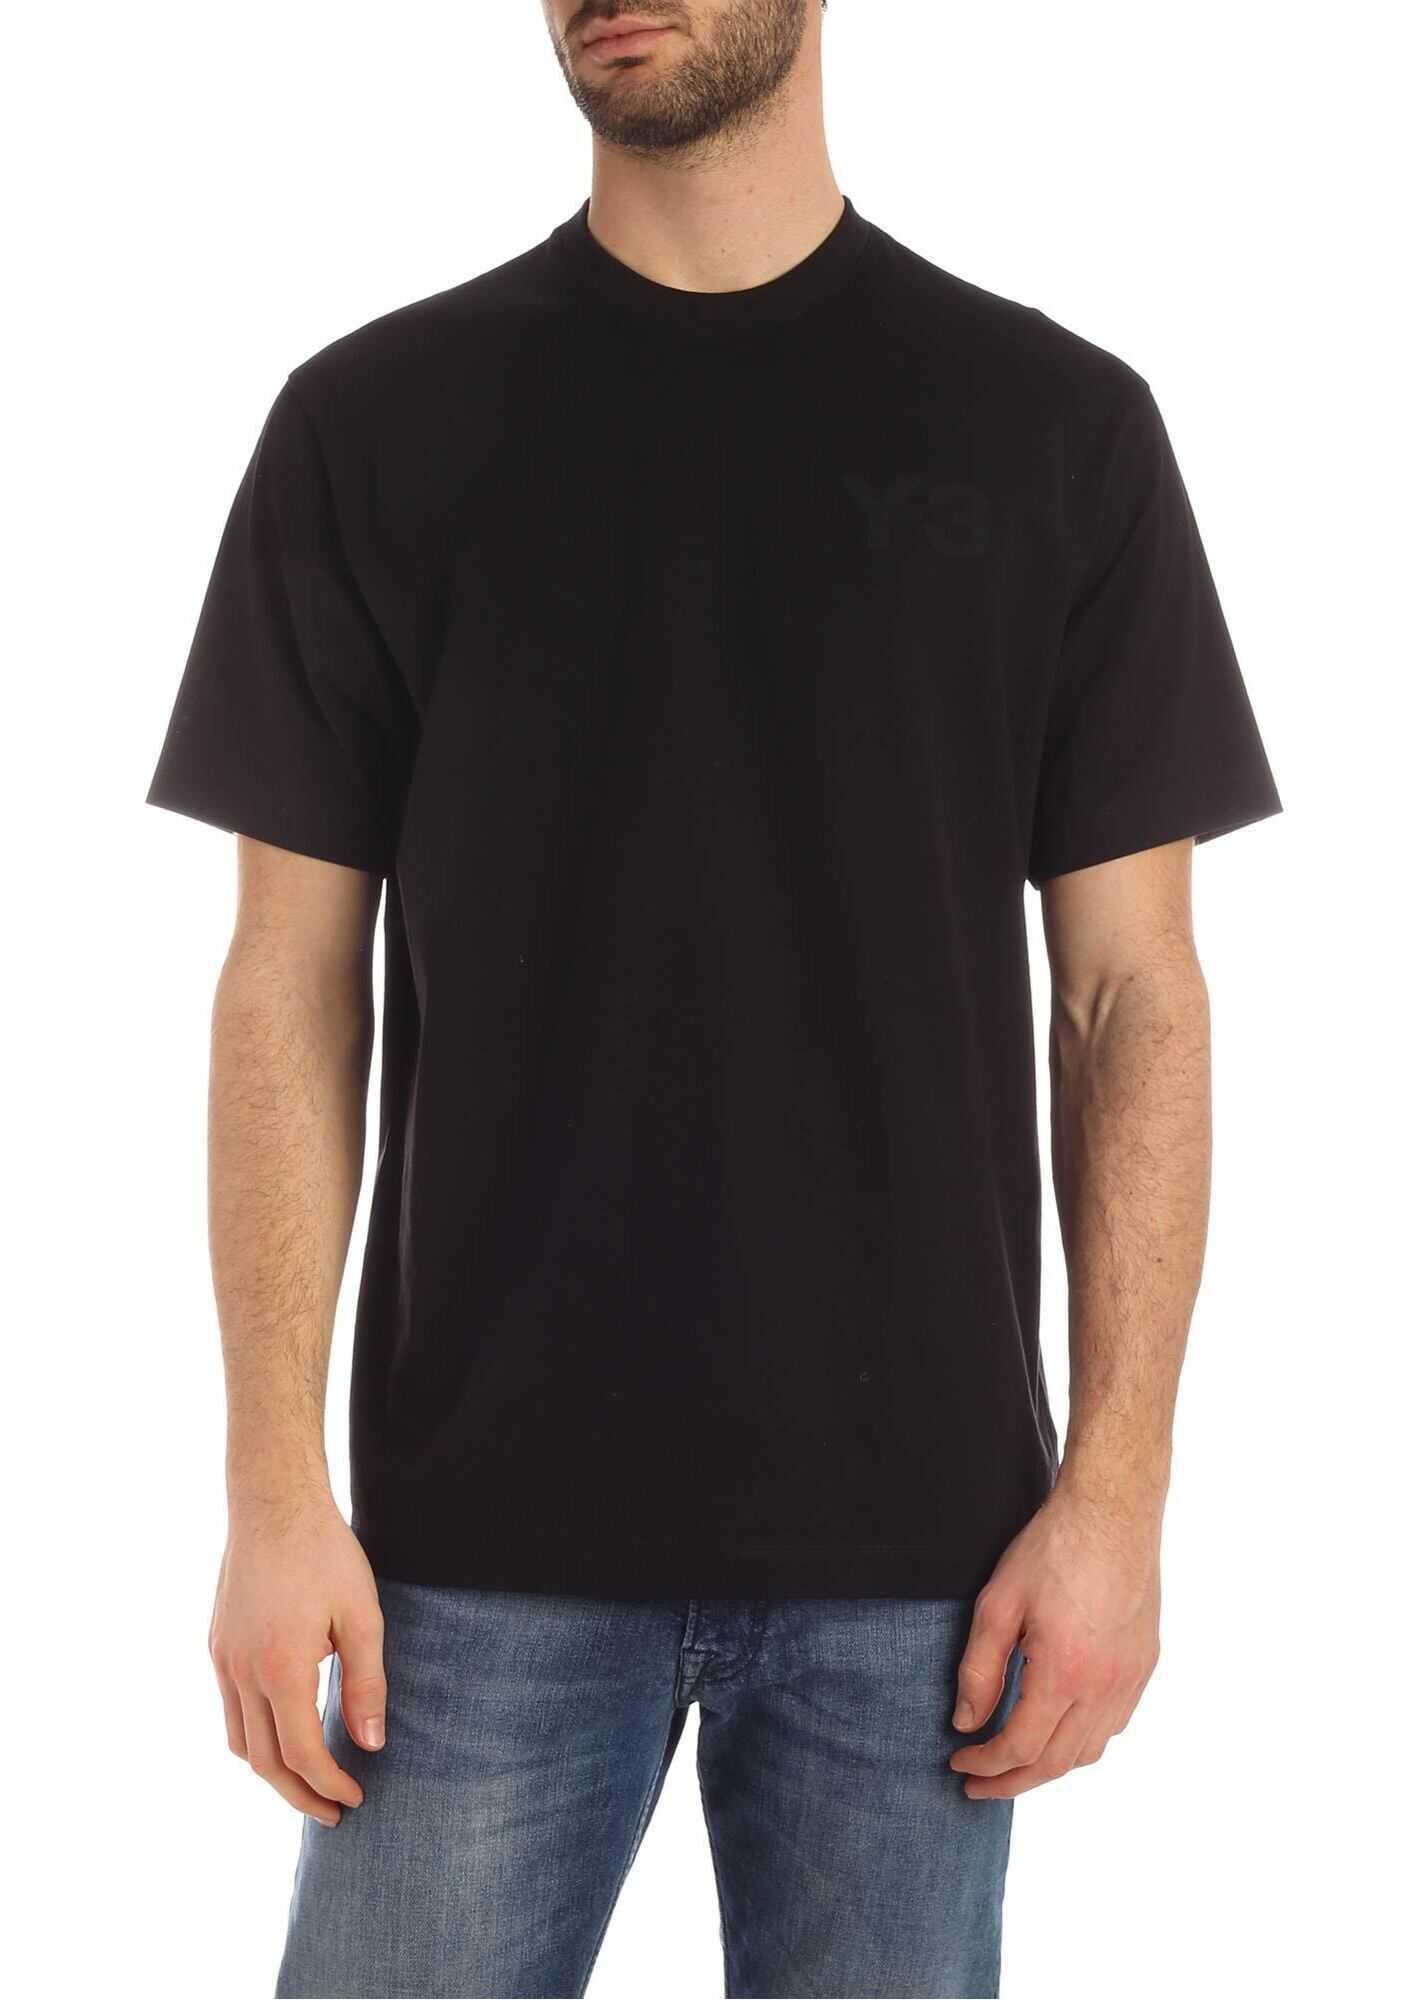 Y-3 Cl Logo T-Shirt In Black Black